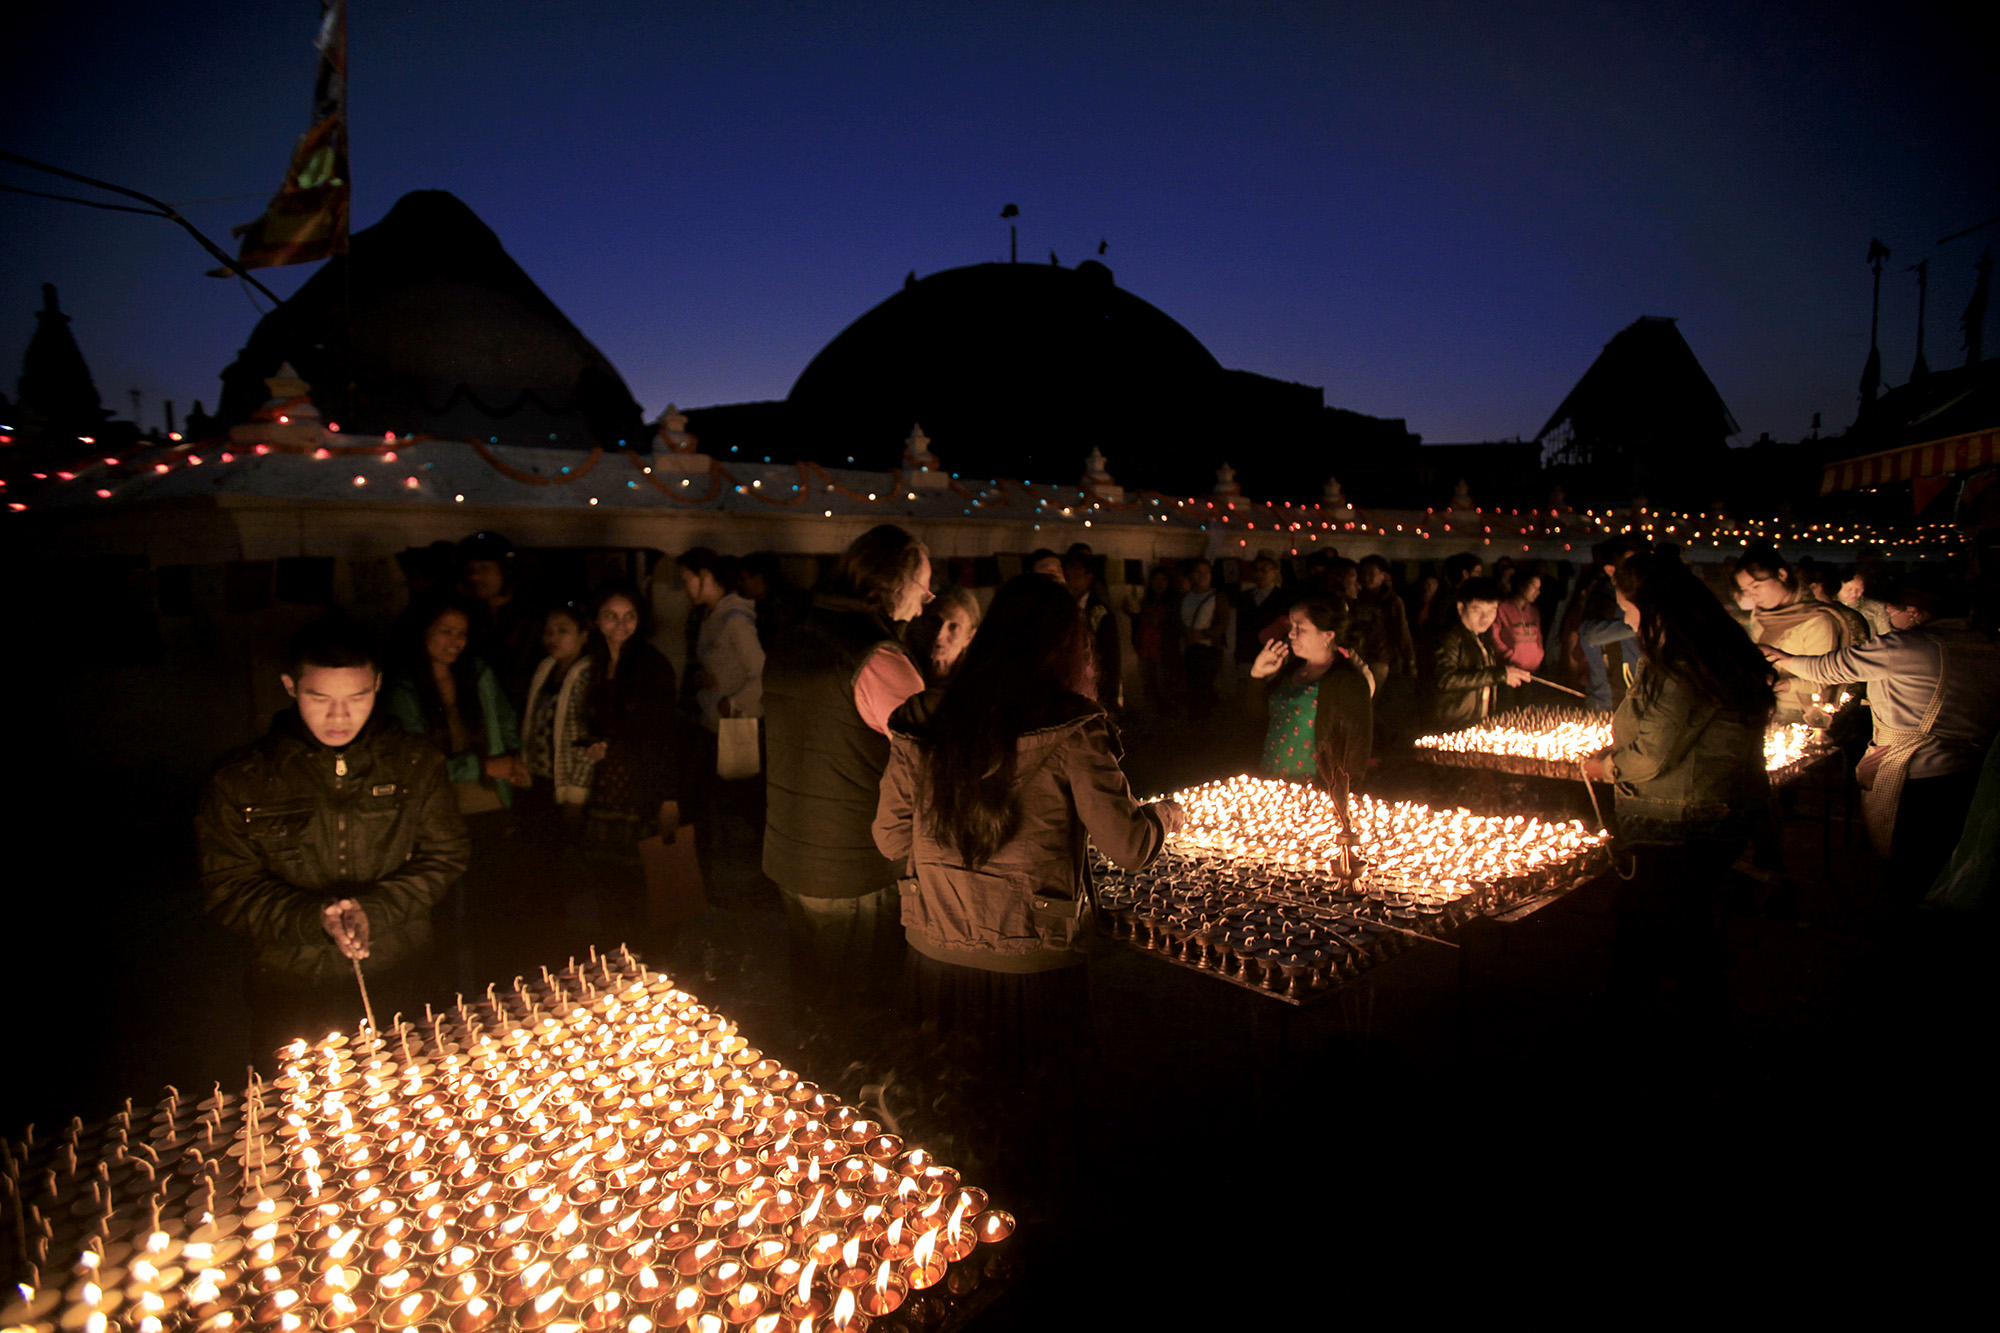 Reportage | Reportage | Losan Piatti - Fotografo Italia_Nepal 2015_Boudhanat StupaLosan Piatti - Fotografo Toscana_Nepal 2015 Boudhanat Stupa